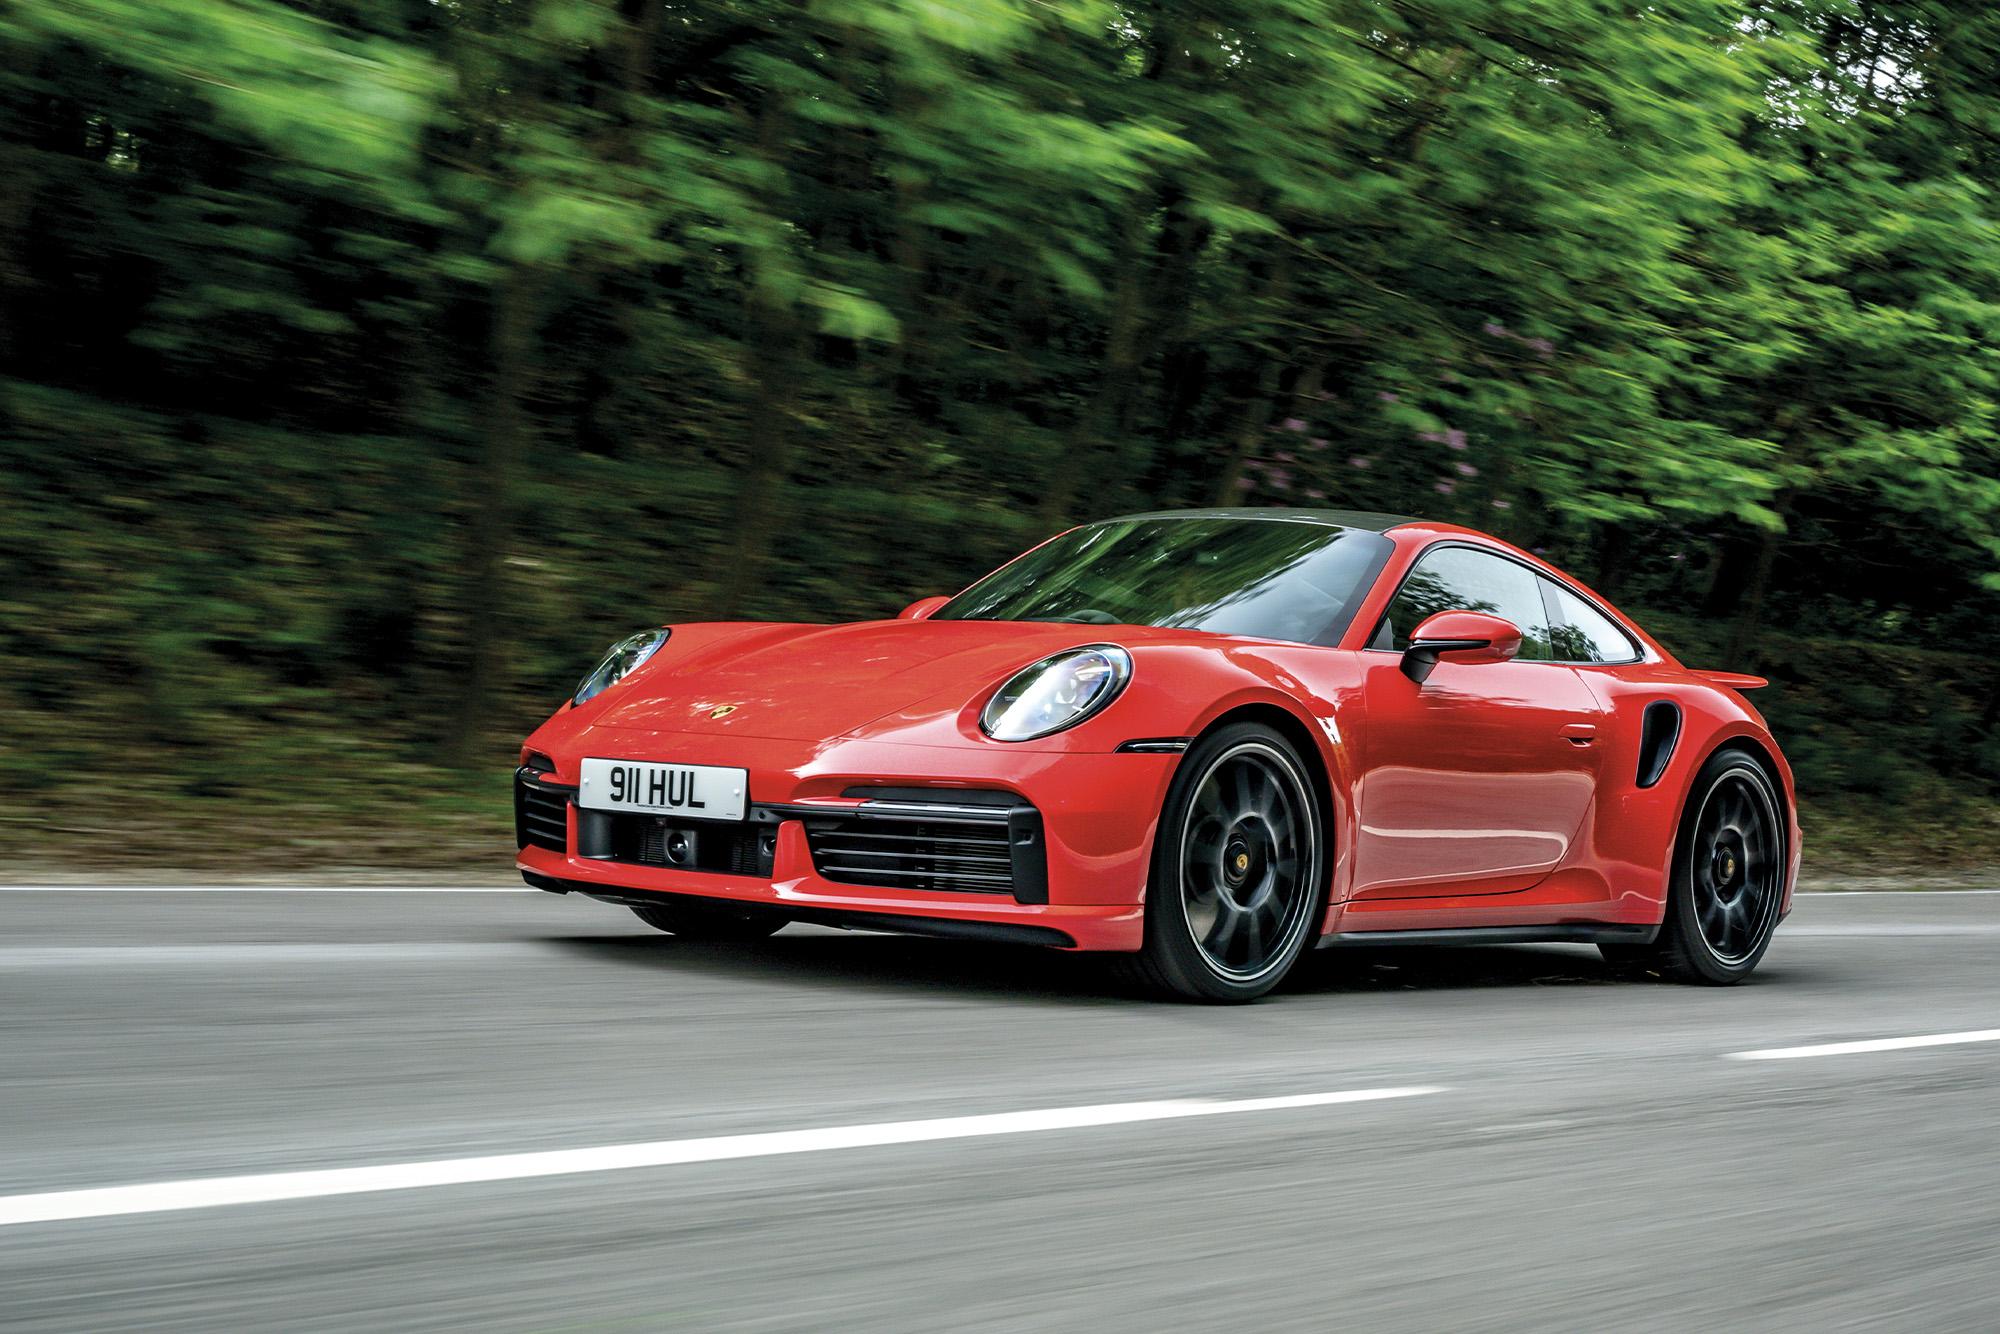 2020 Porsche 911 Turbo S on the road